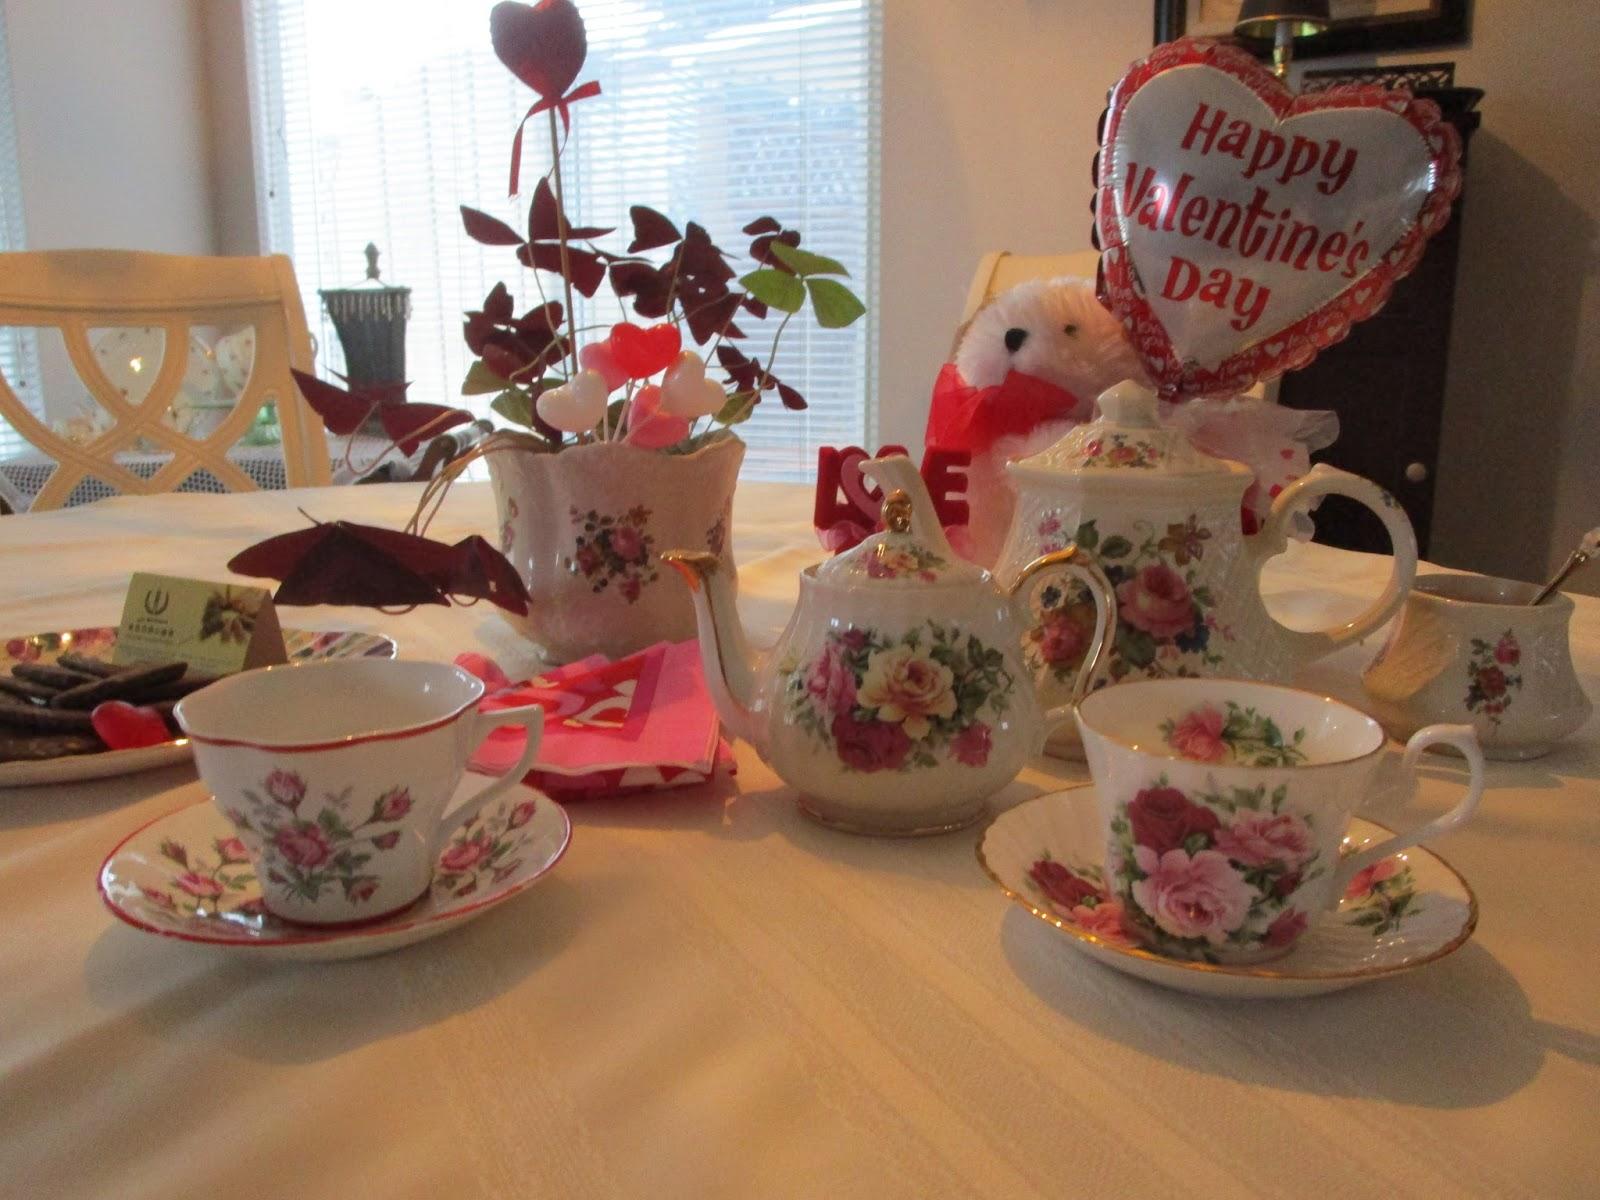 Karen's Cottage and Castle: Happy Valentine's Day!